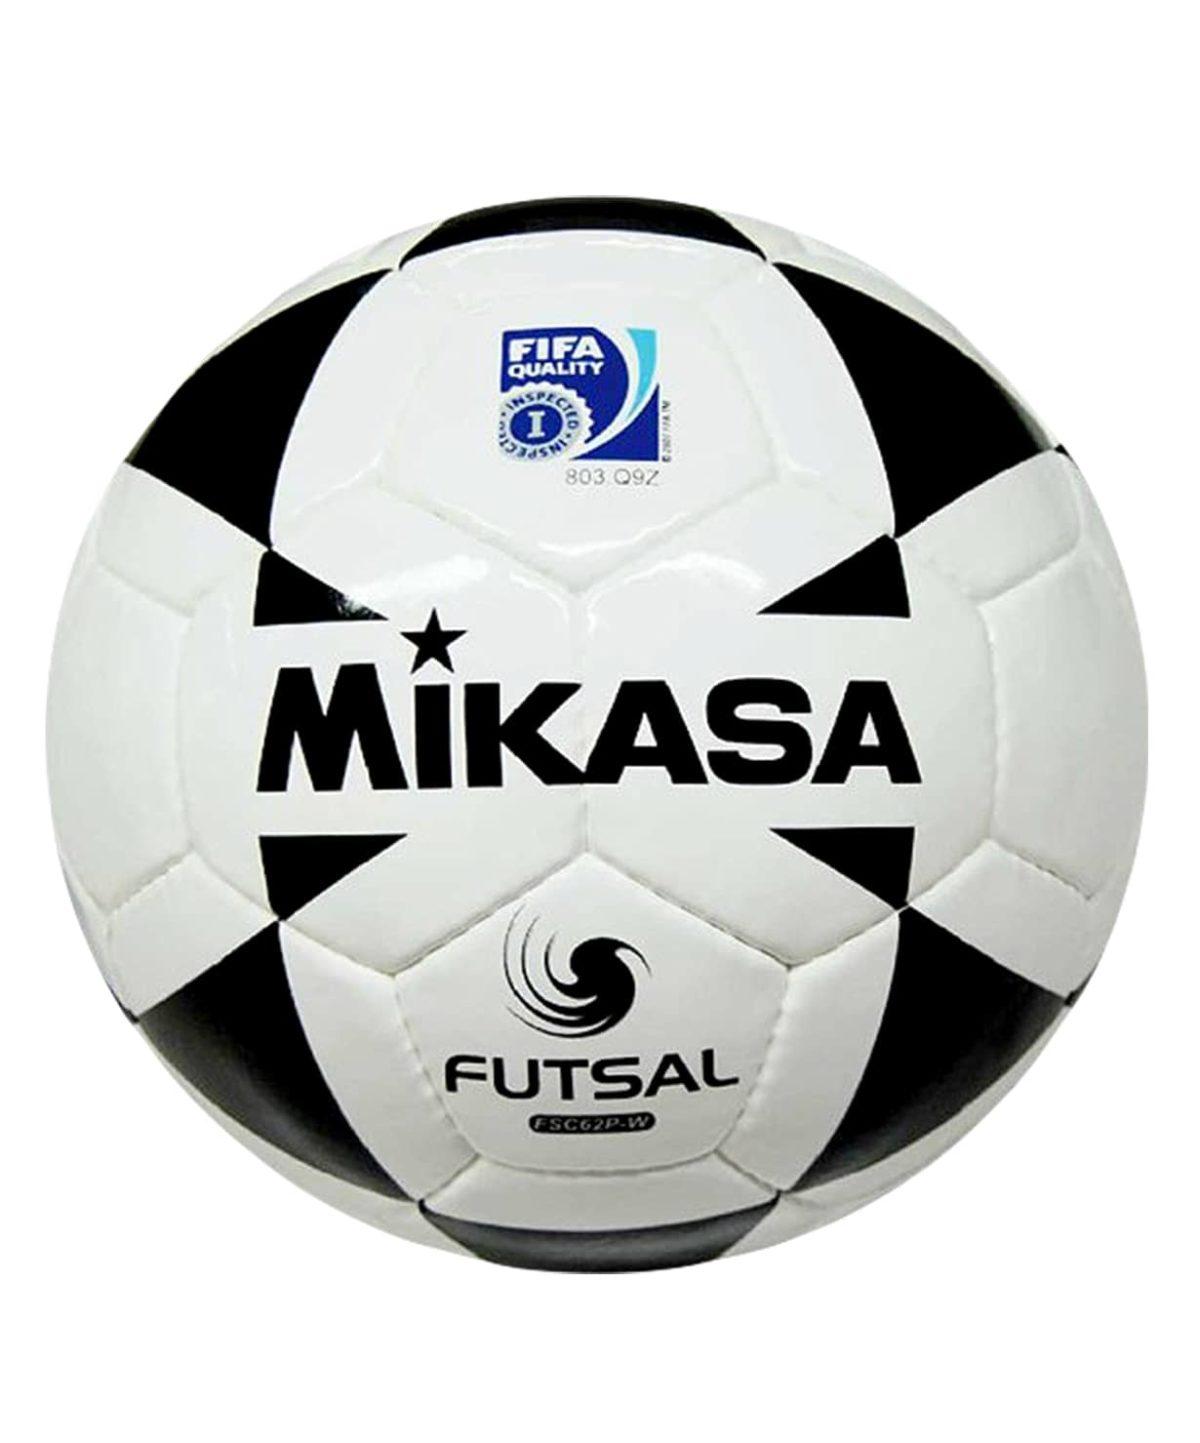 MIKASA Мяч футзальный FIFA FSC-62 P-W №4 - 1